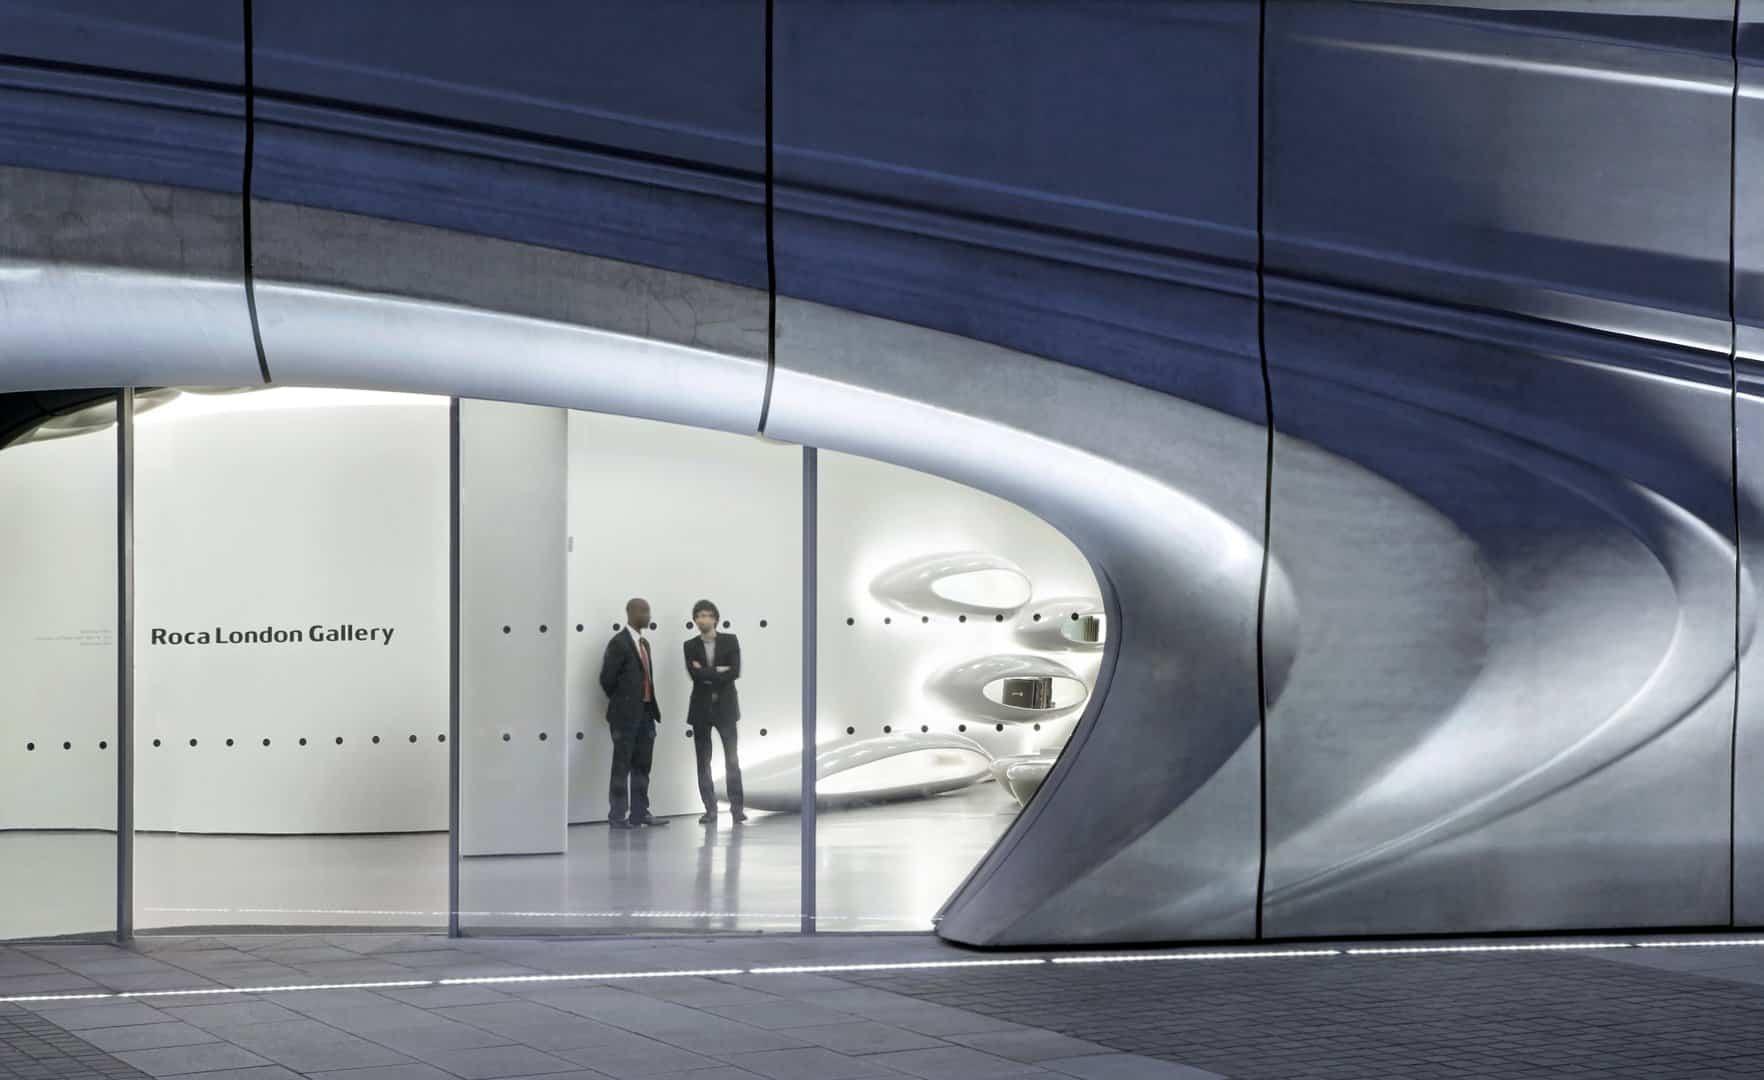 Zaha-Hadid-Product-Design-the-roca-gallery-london-01753